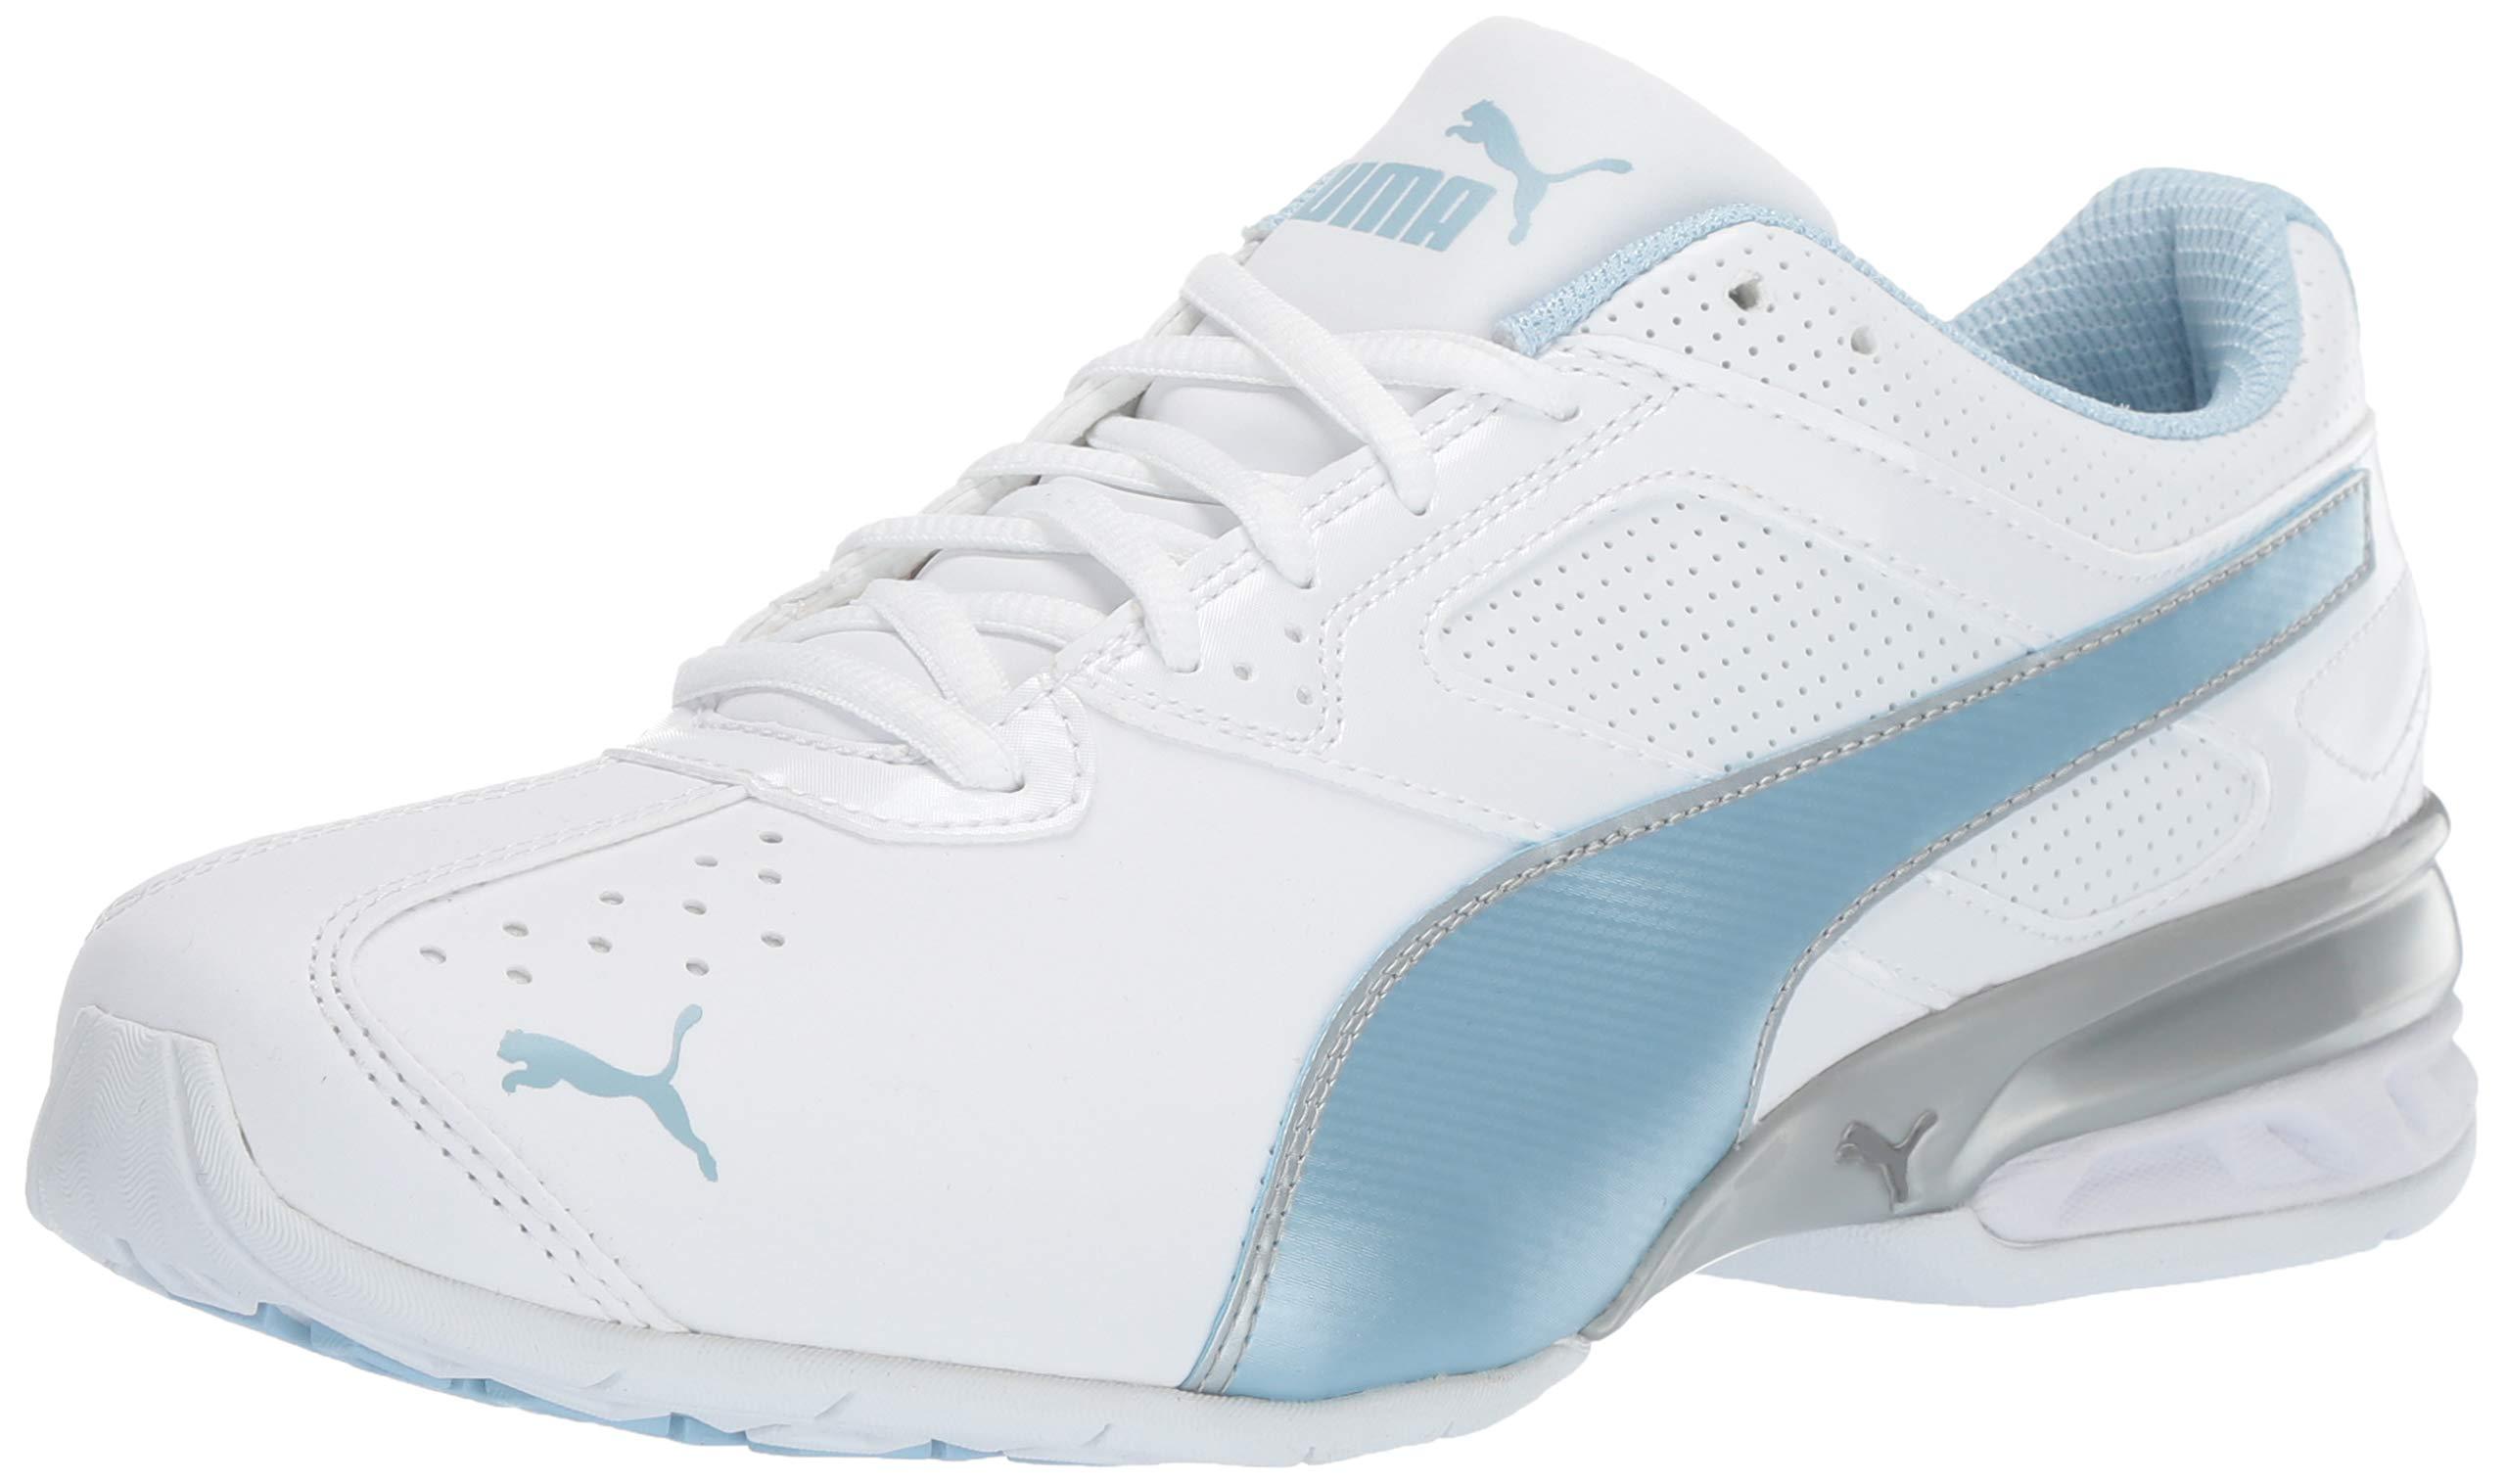 PUMA Women's Tazon 6 FM Sneaker, White-Cerulean Silver, 6 M US